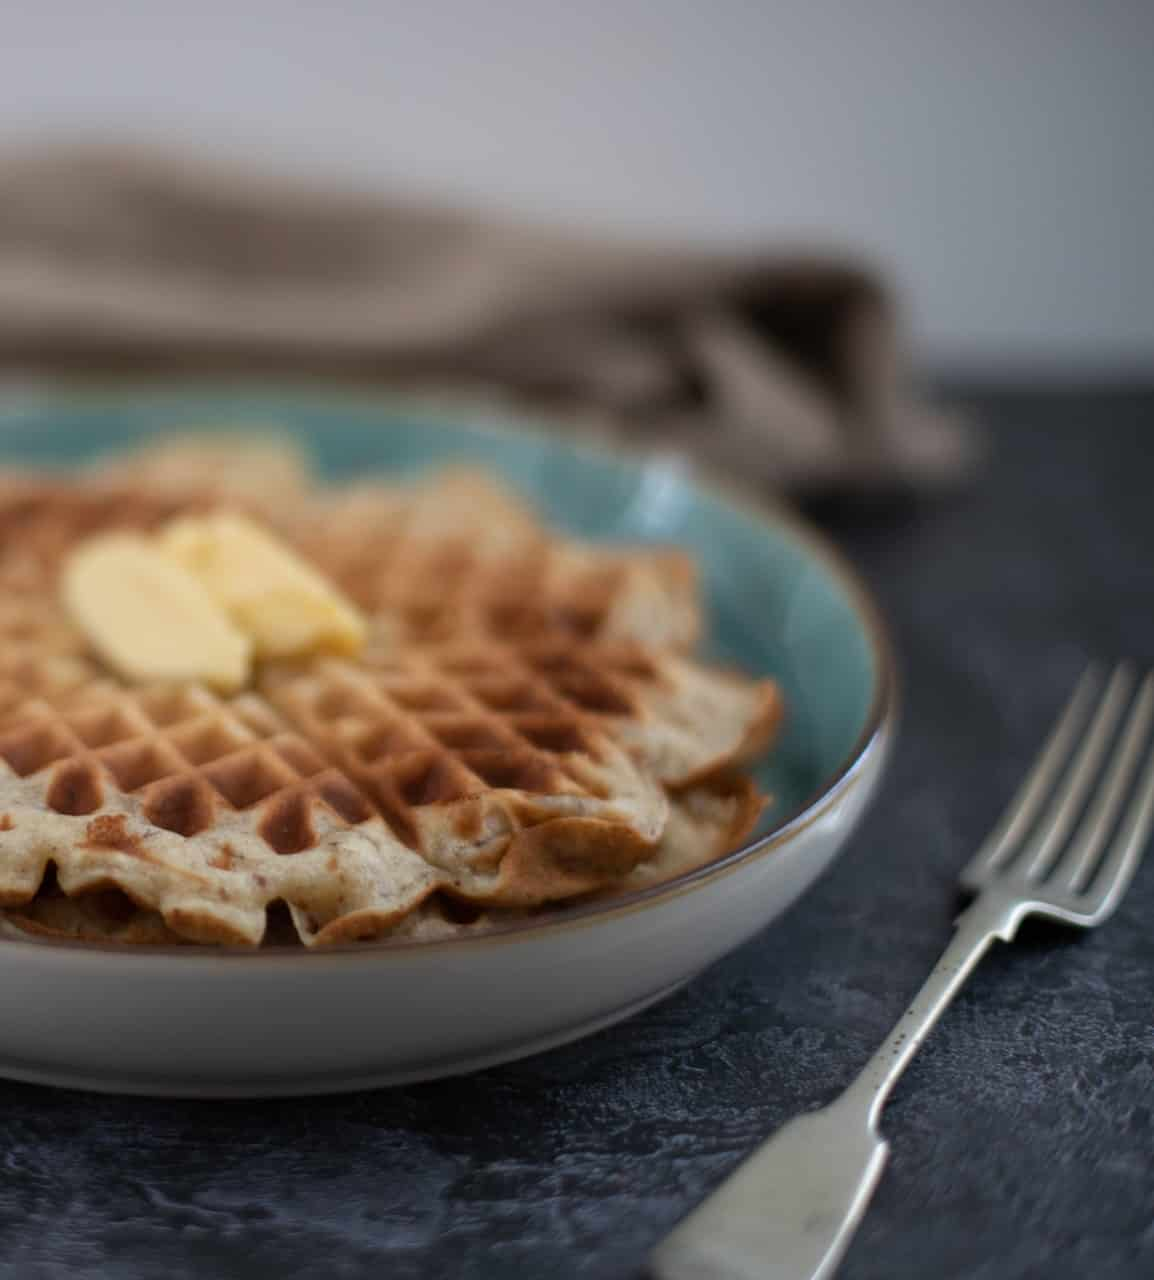 How to Make Perfect Vegan Waffles